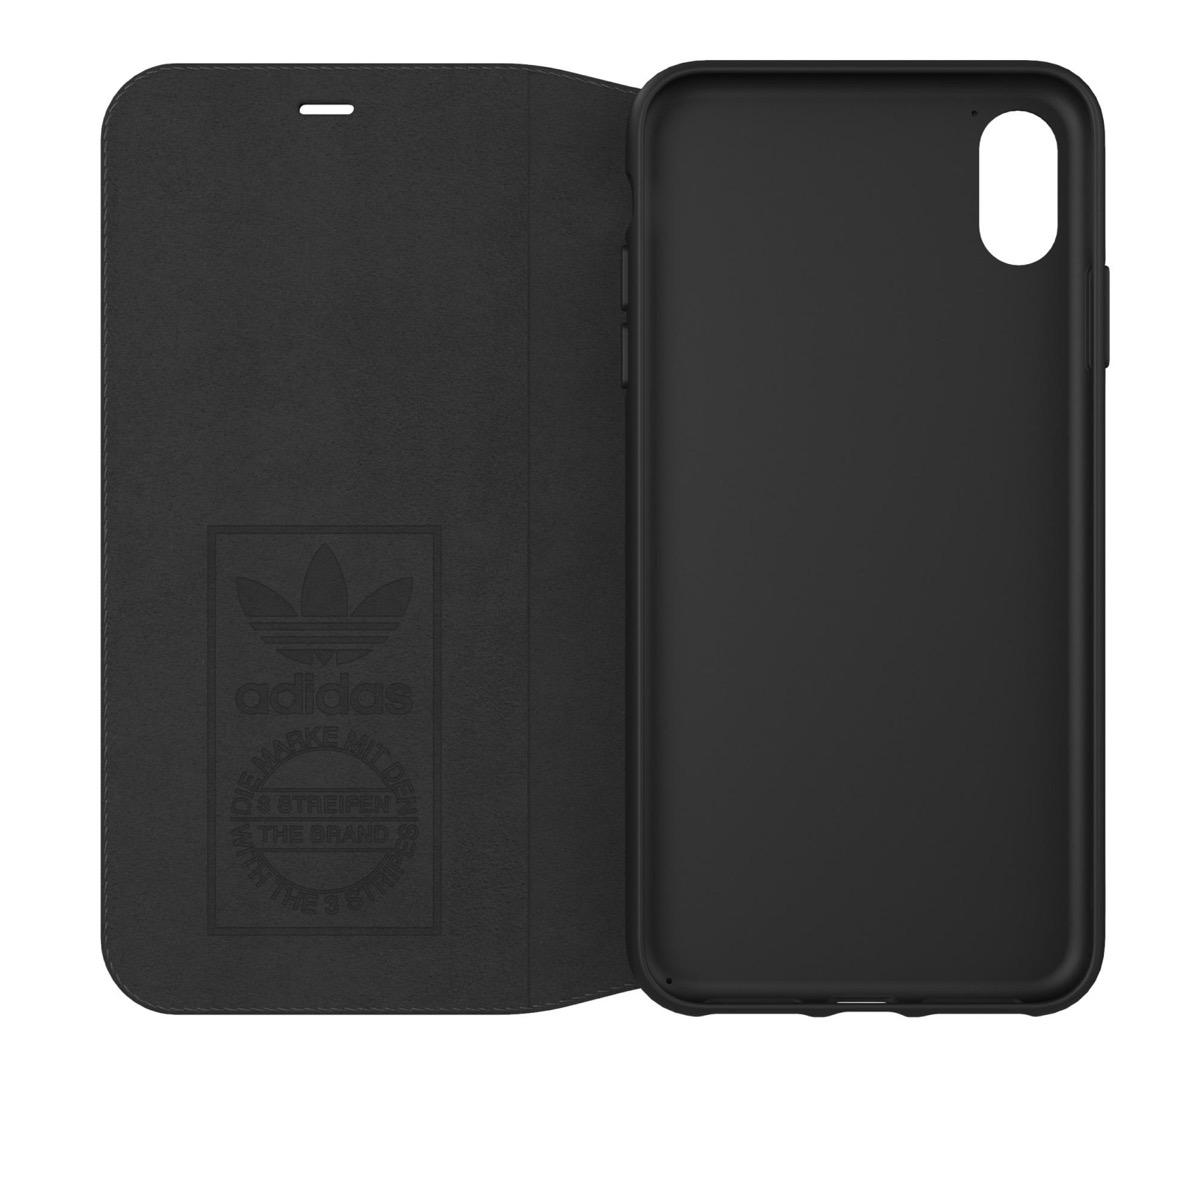 e3a232ffbb iPhone XS Max海外輸入ブランド商品|株式会社エム・エス・シー ページ 6 ...